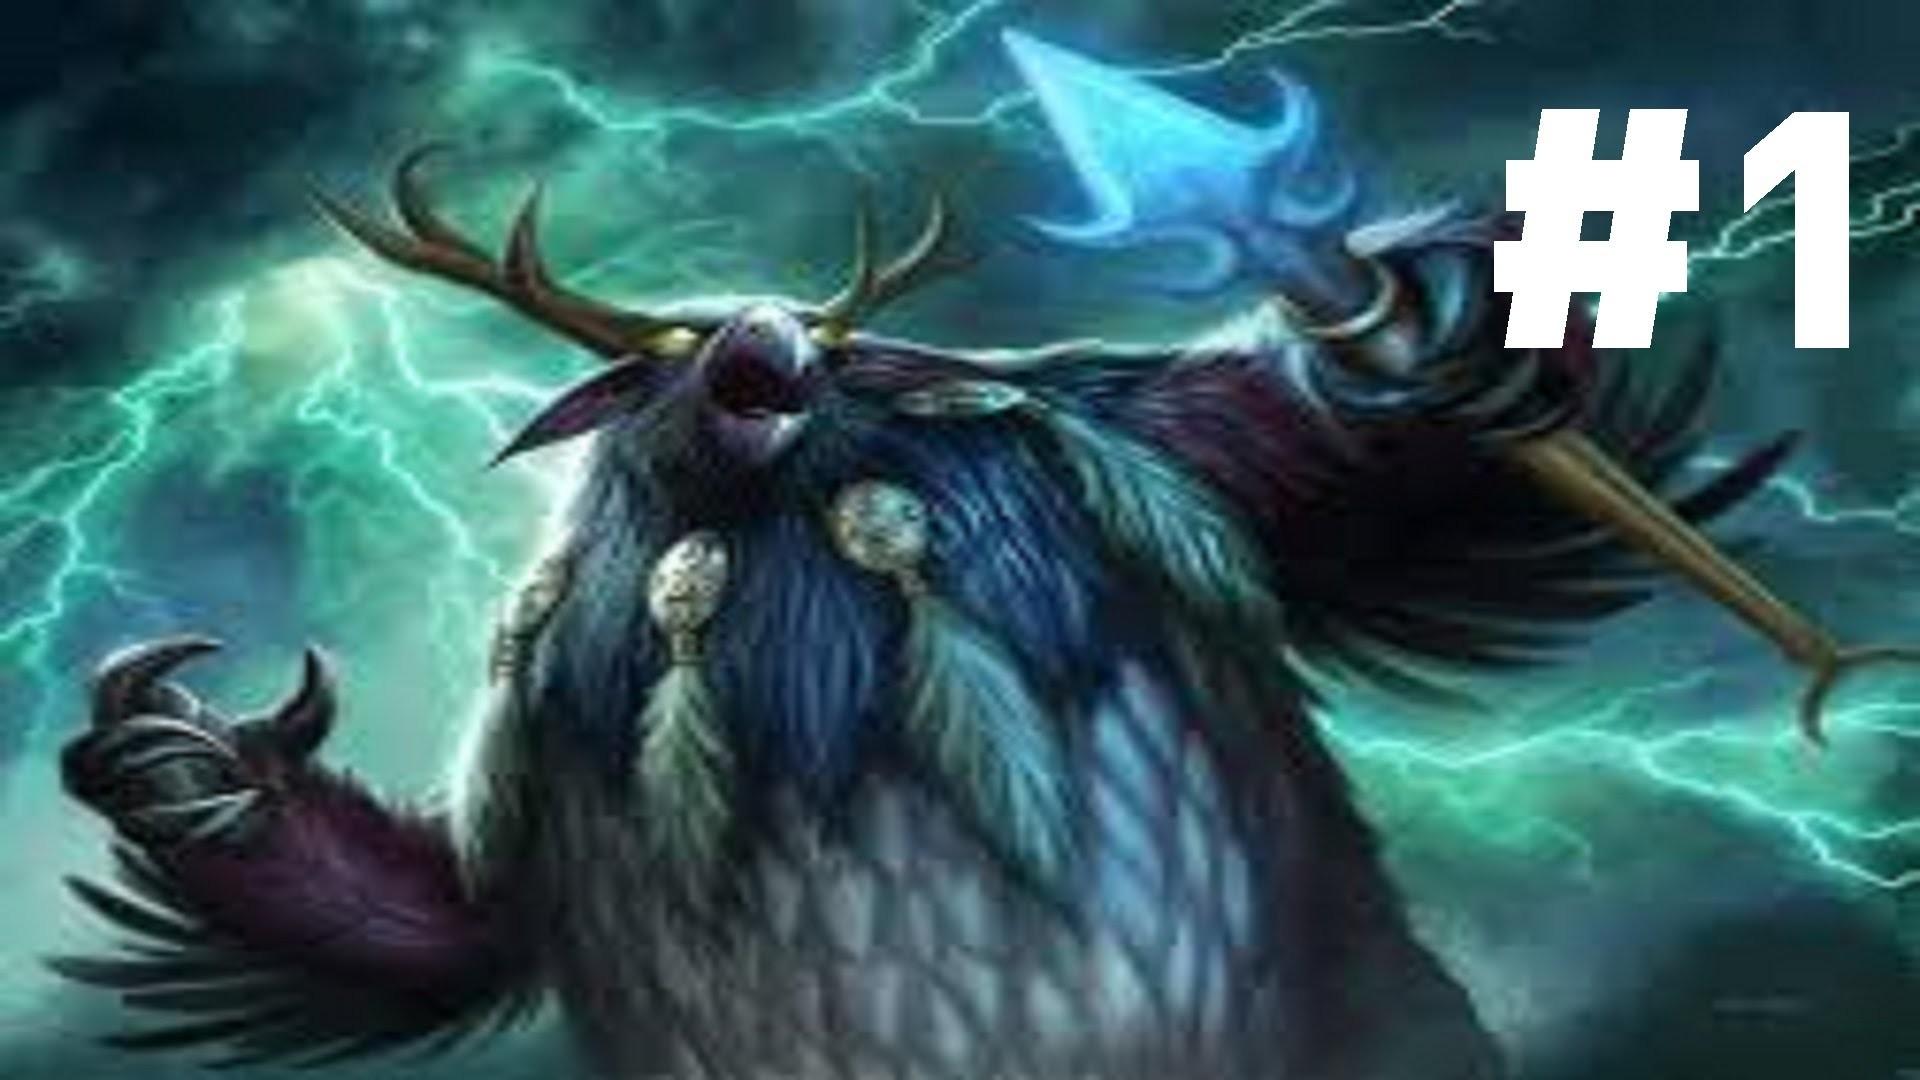 WoW: Leveling a balance druid part 1